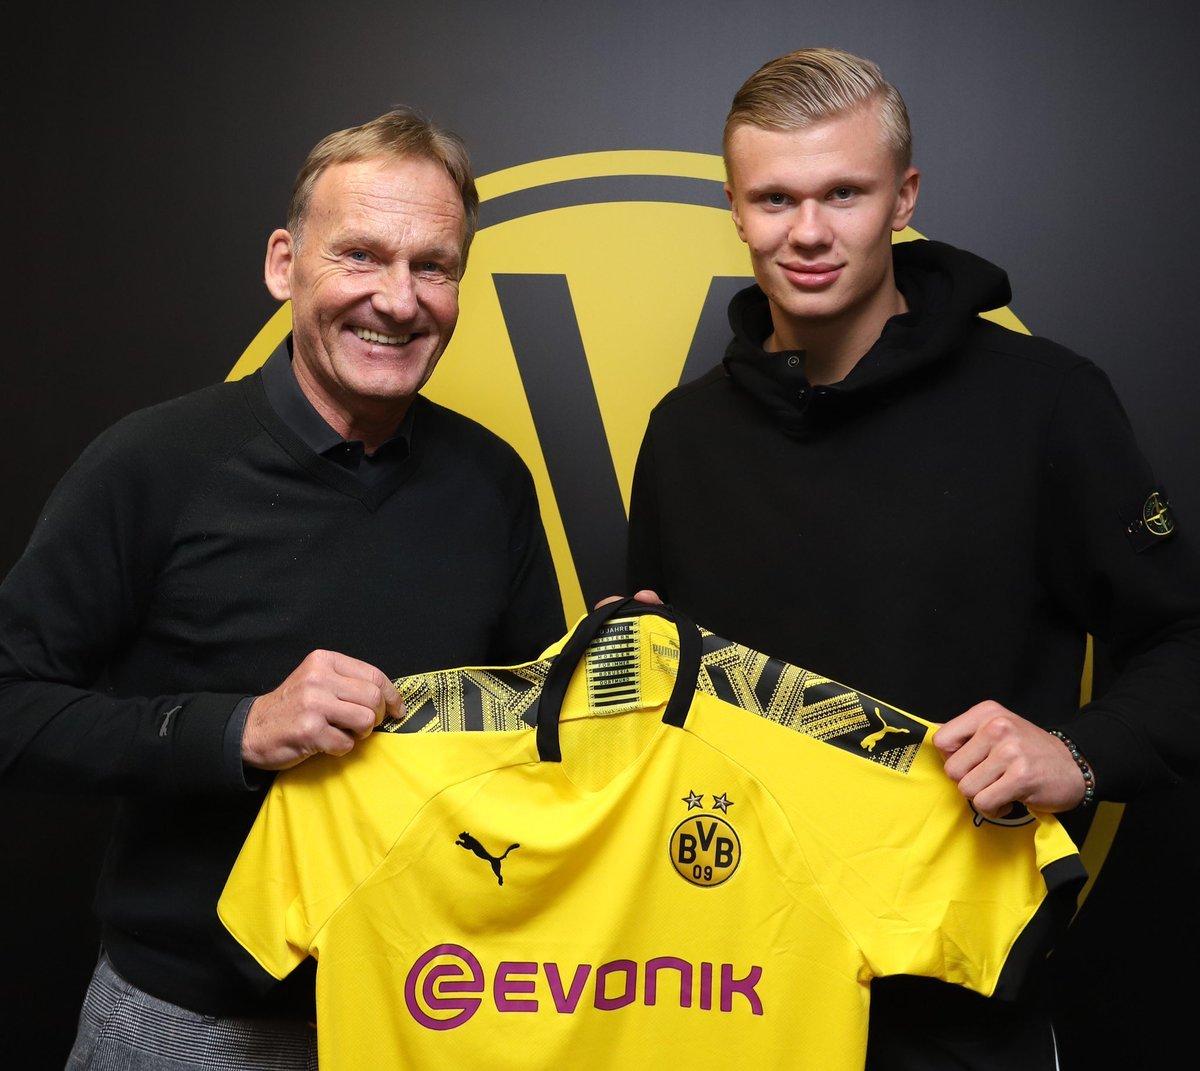 Erling Haaland bỏ qua MU, bất ngờ gia nhập Dortmund